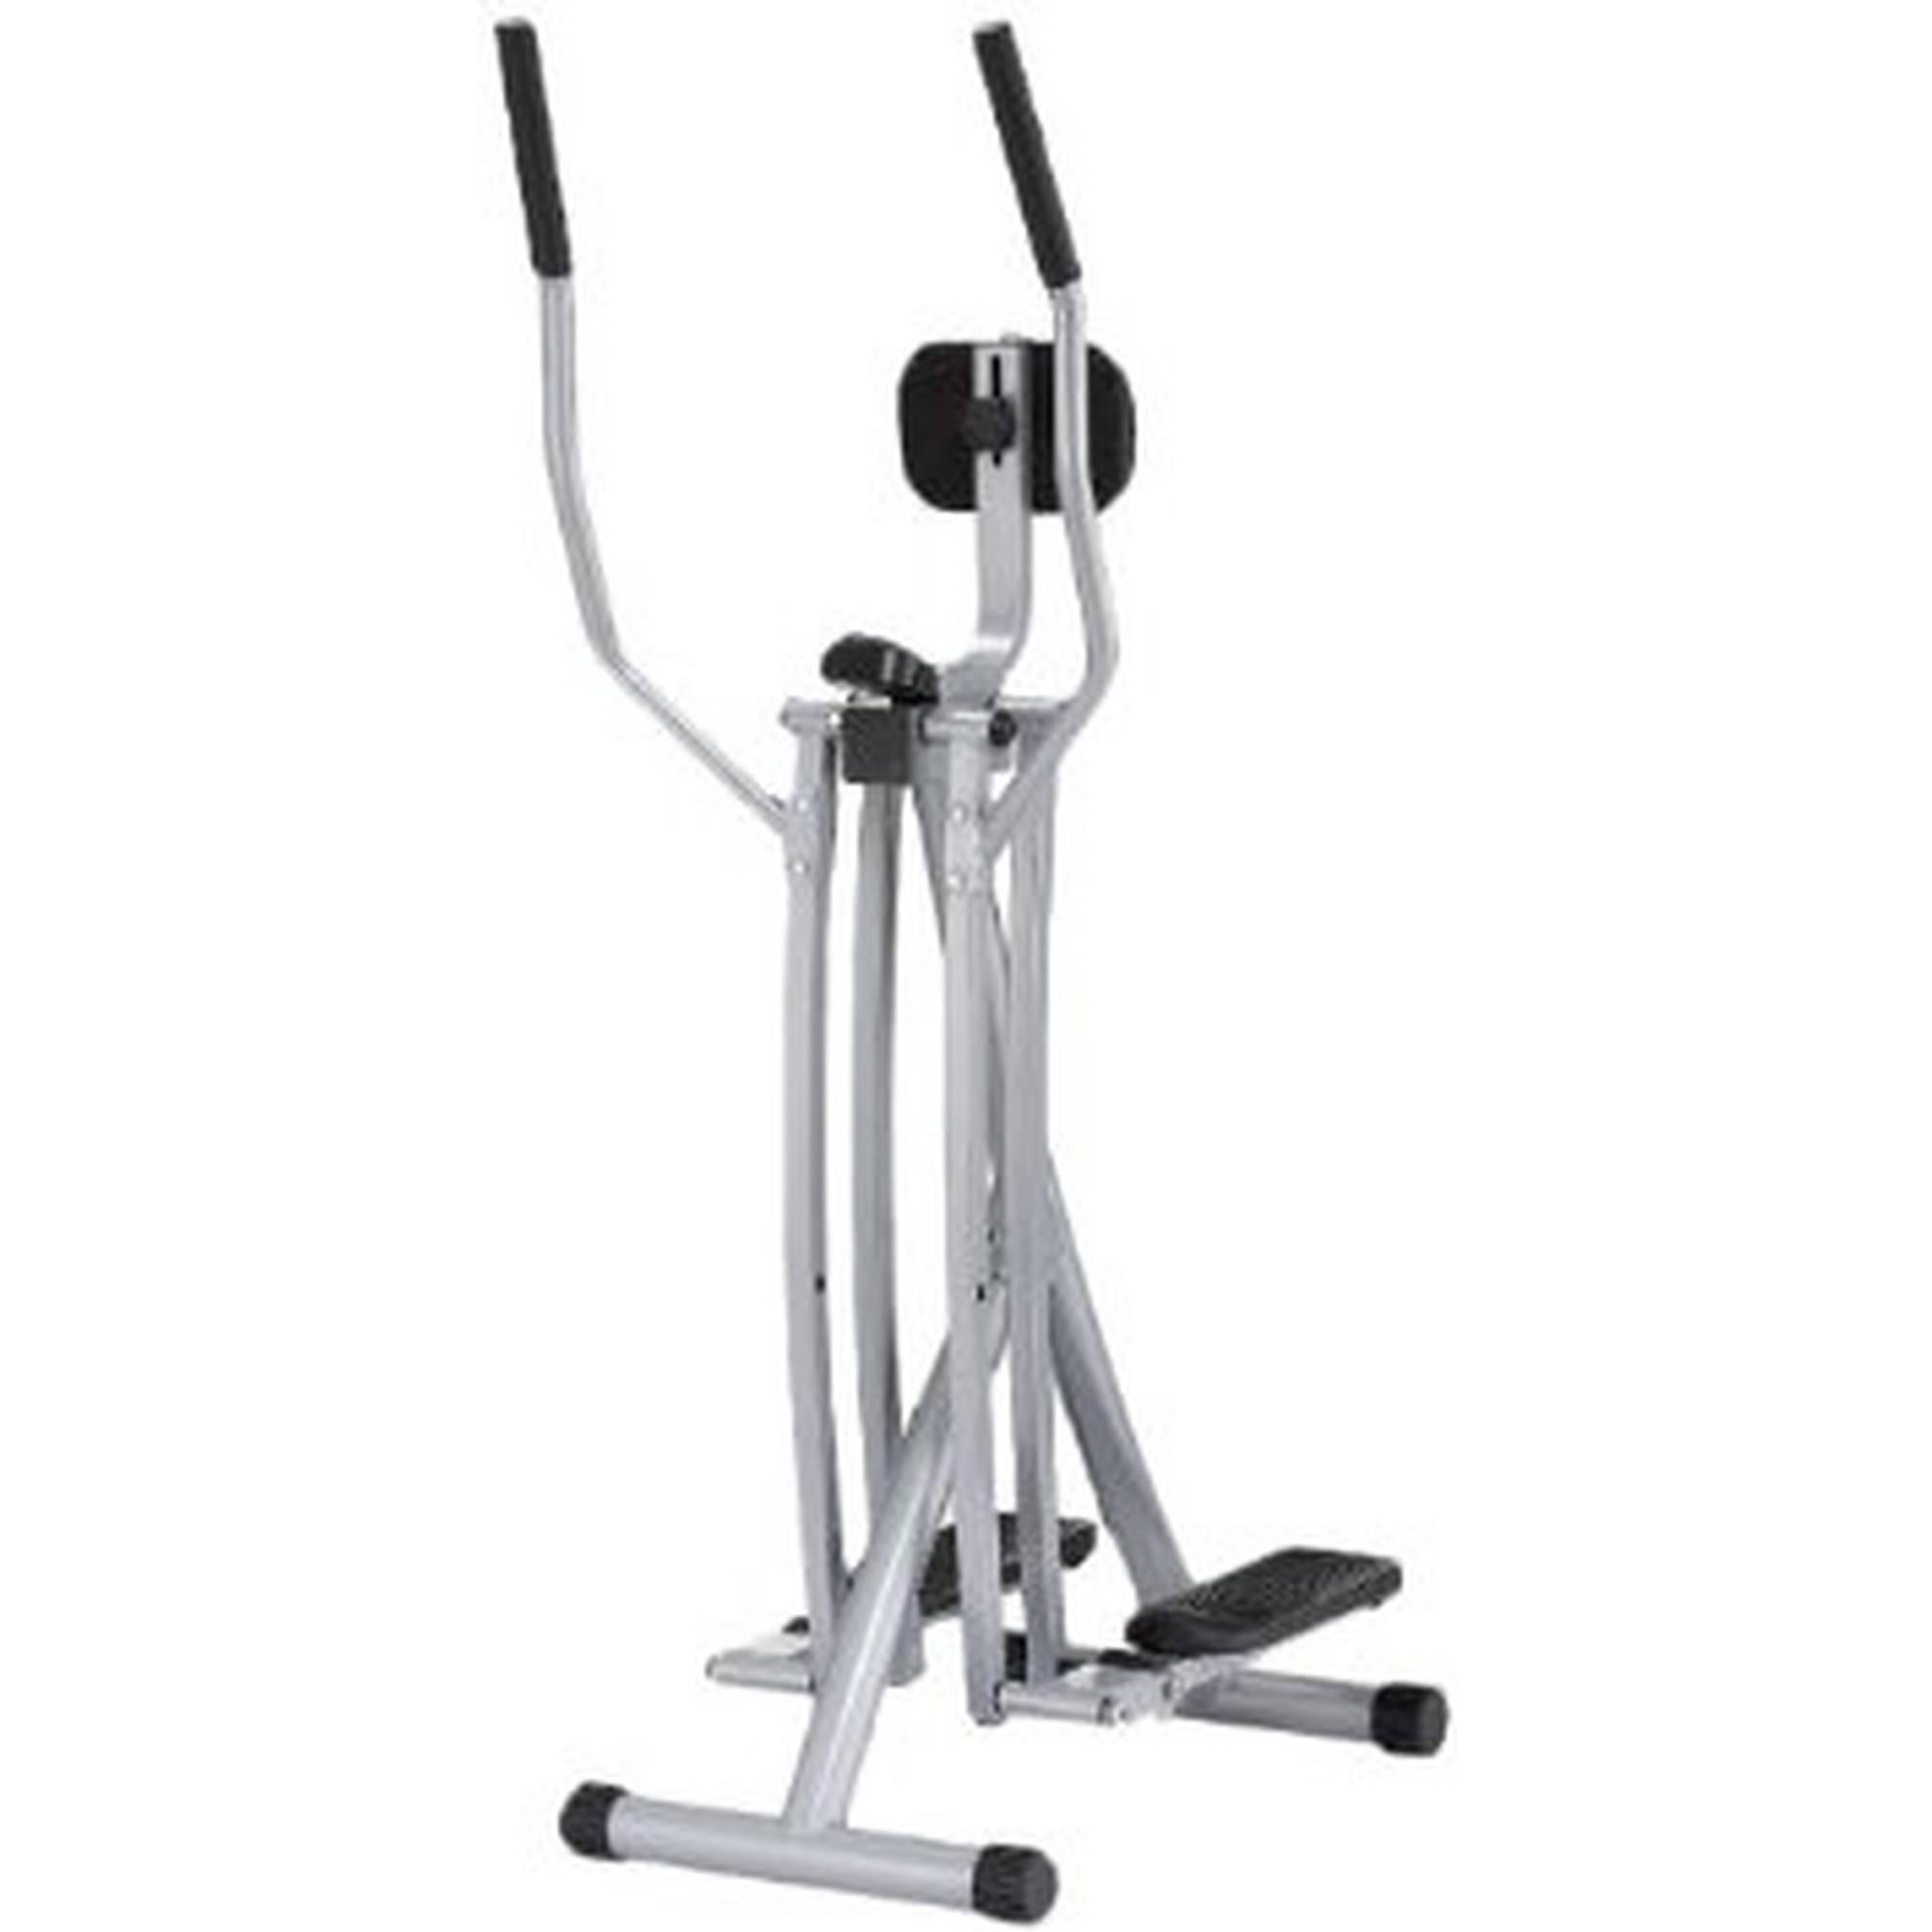 Sunny Health & Fitness SF-E902 Air Walk Trainer Glider w  LCD Monitor by Sunny Health & Fitness